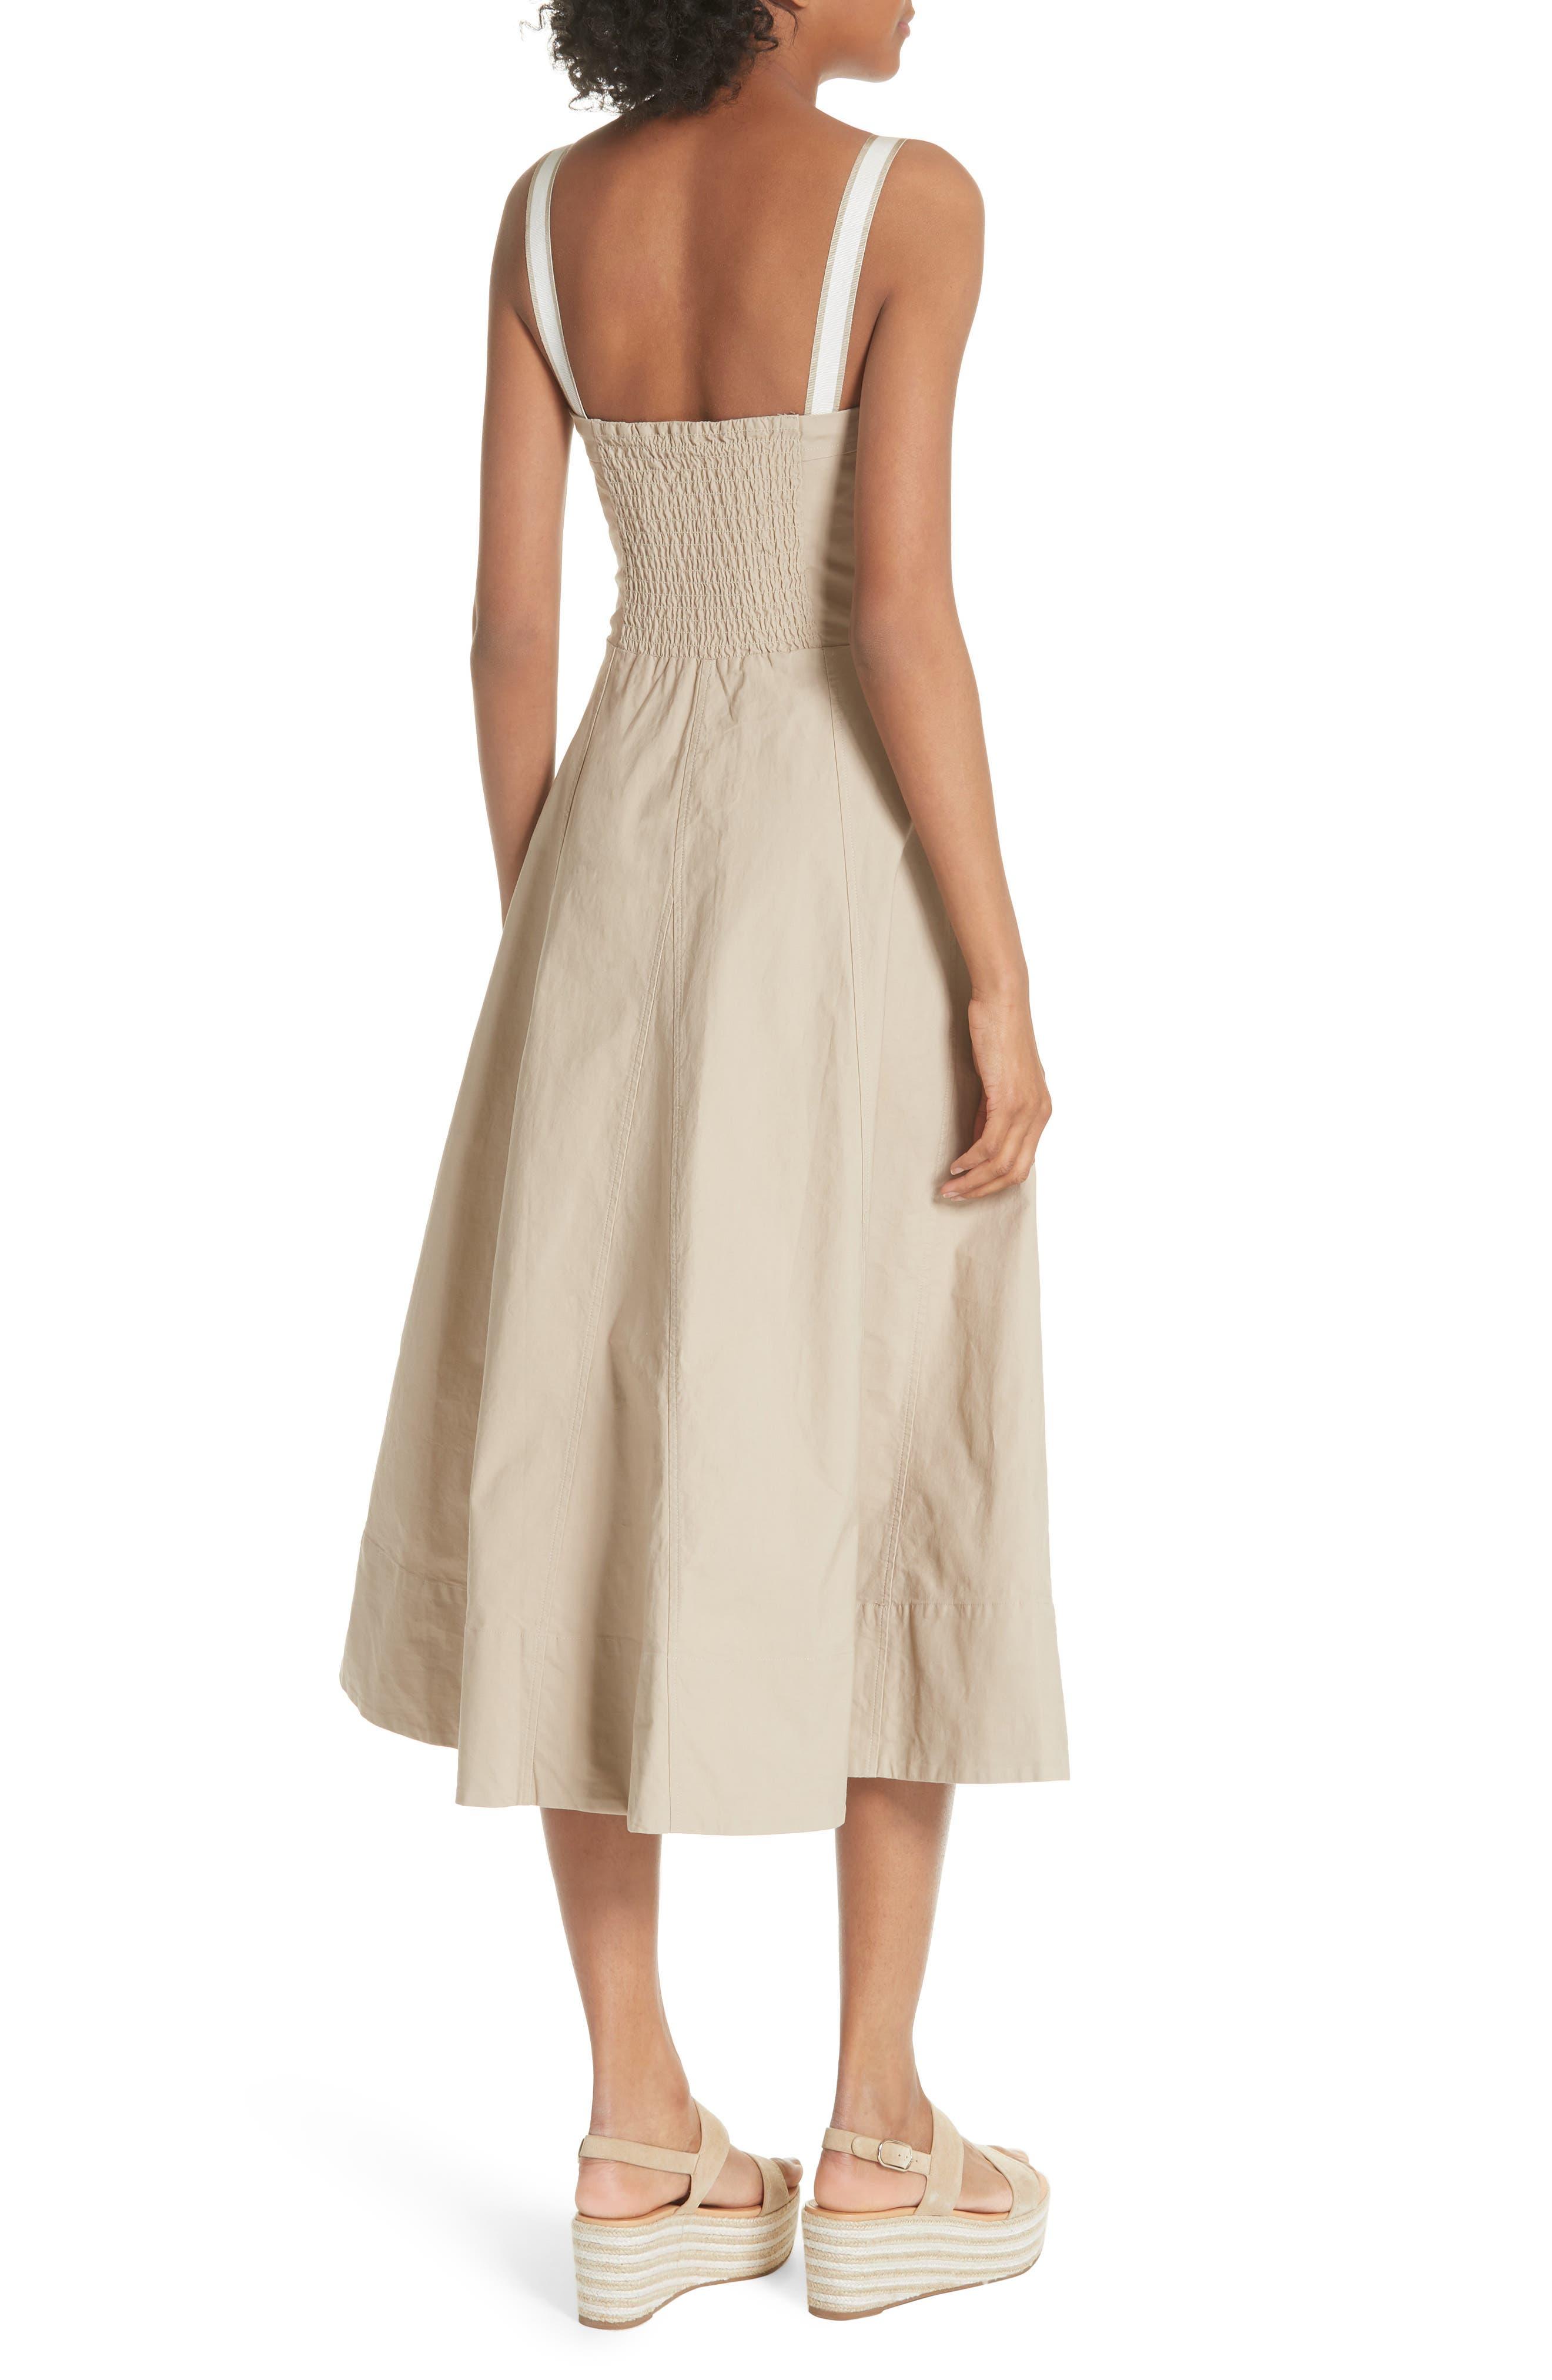 Briel Midi Dress,                             Alternate thumbnail 2, color,                             Light Sand